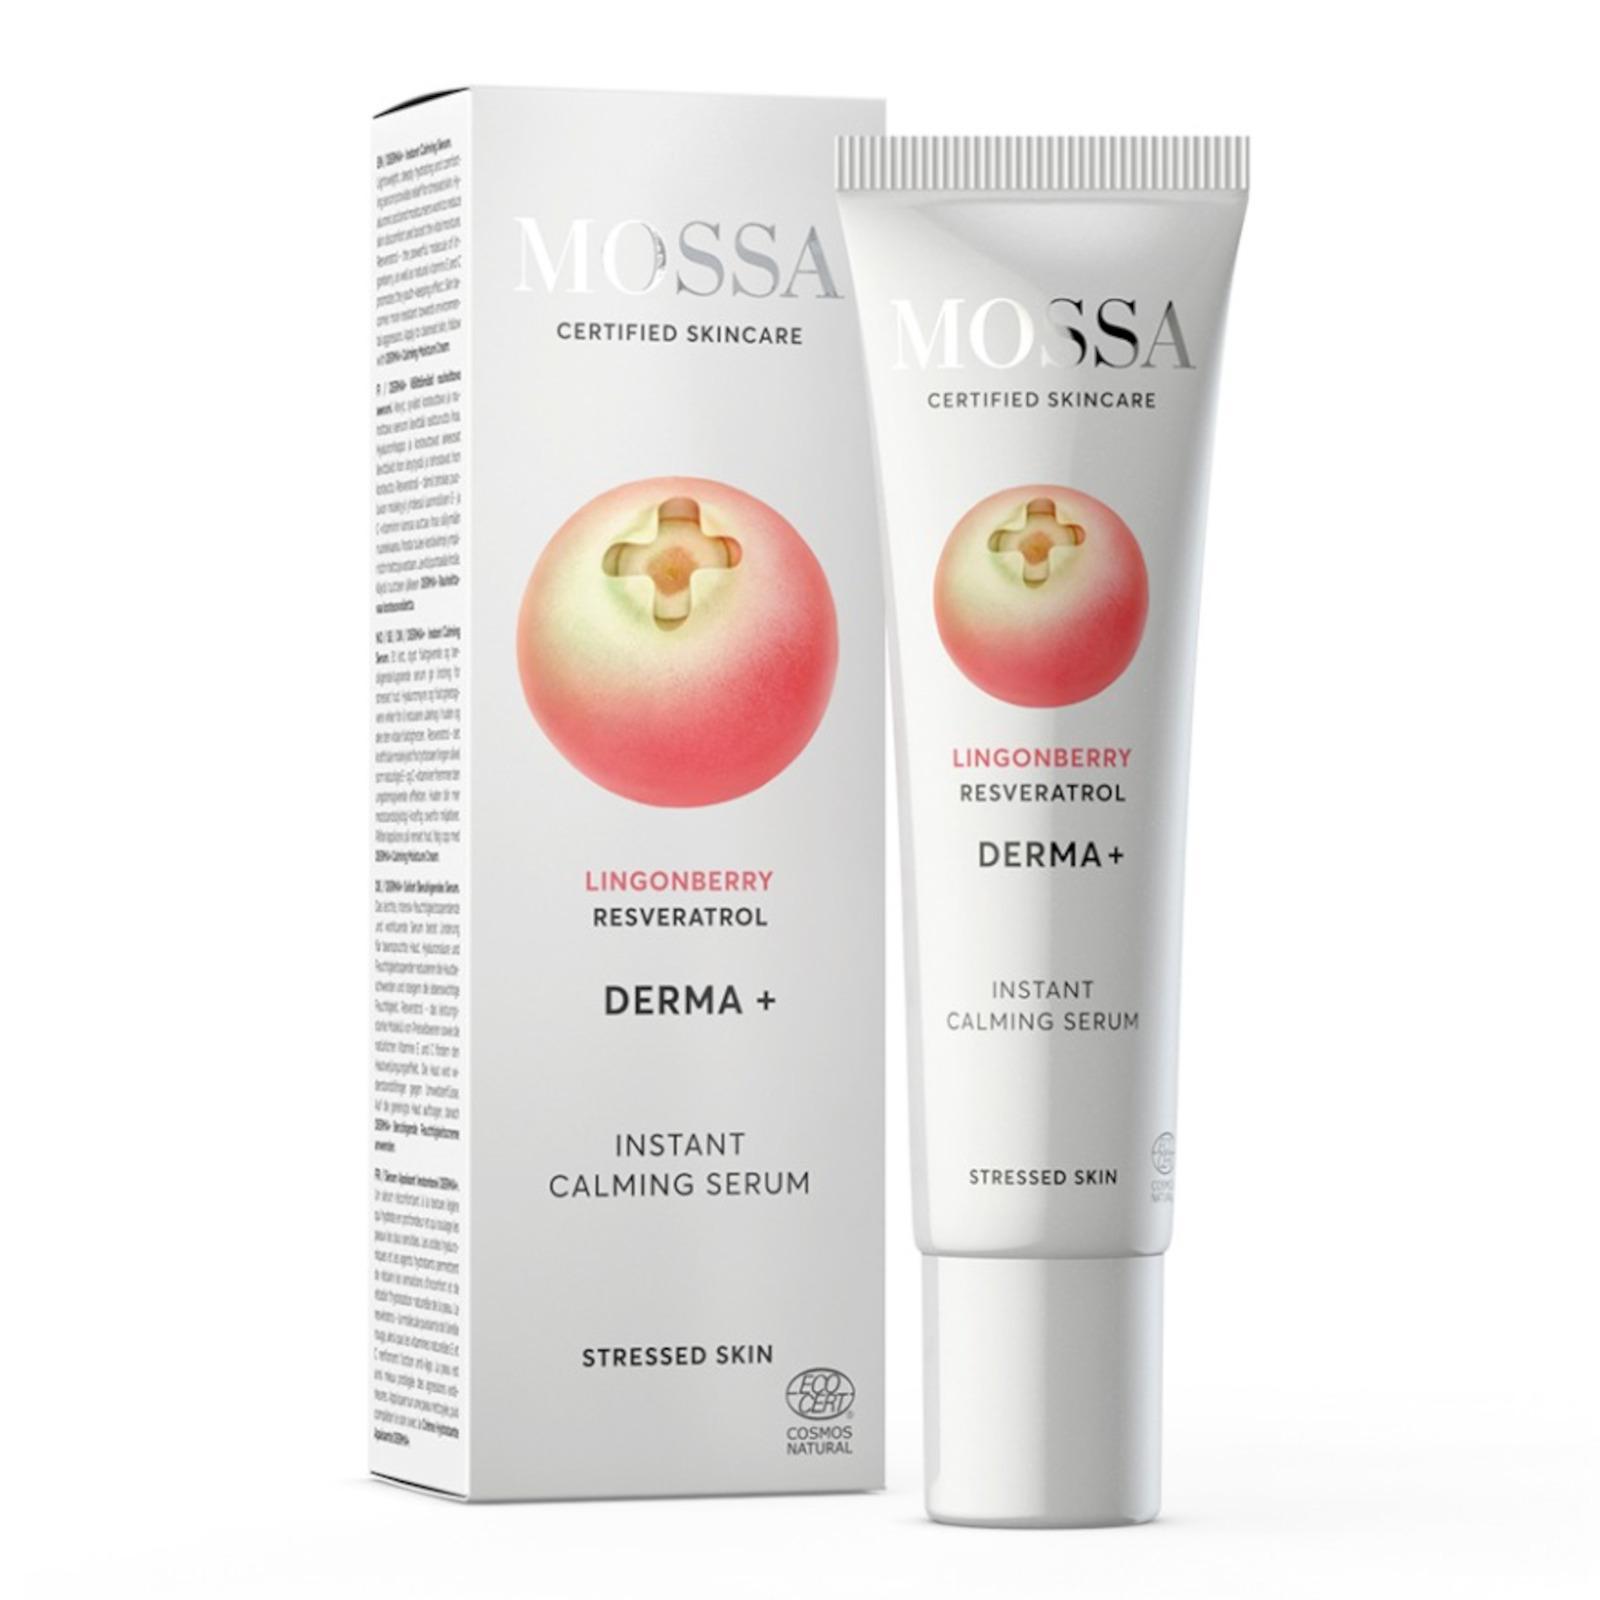 MOSSA Derma+, Zklidňující sérum 30 ml